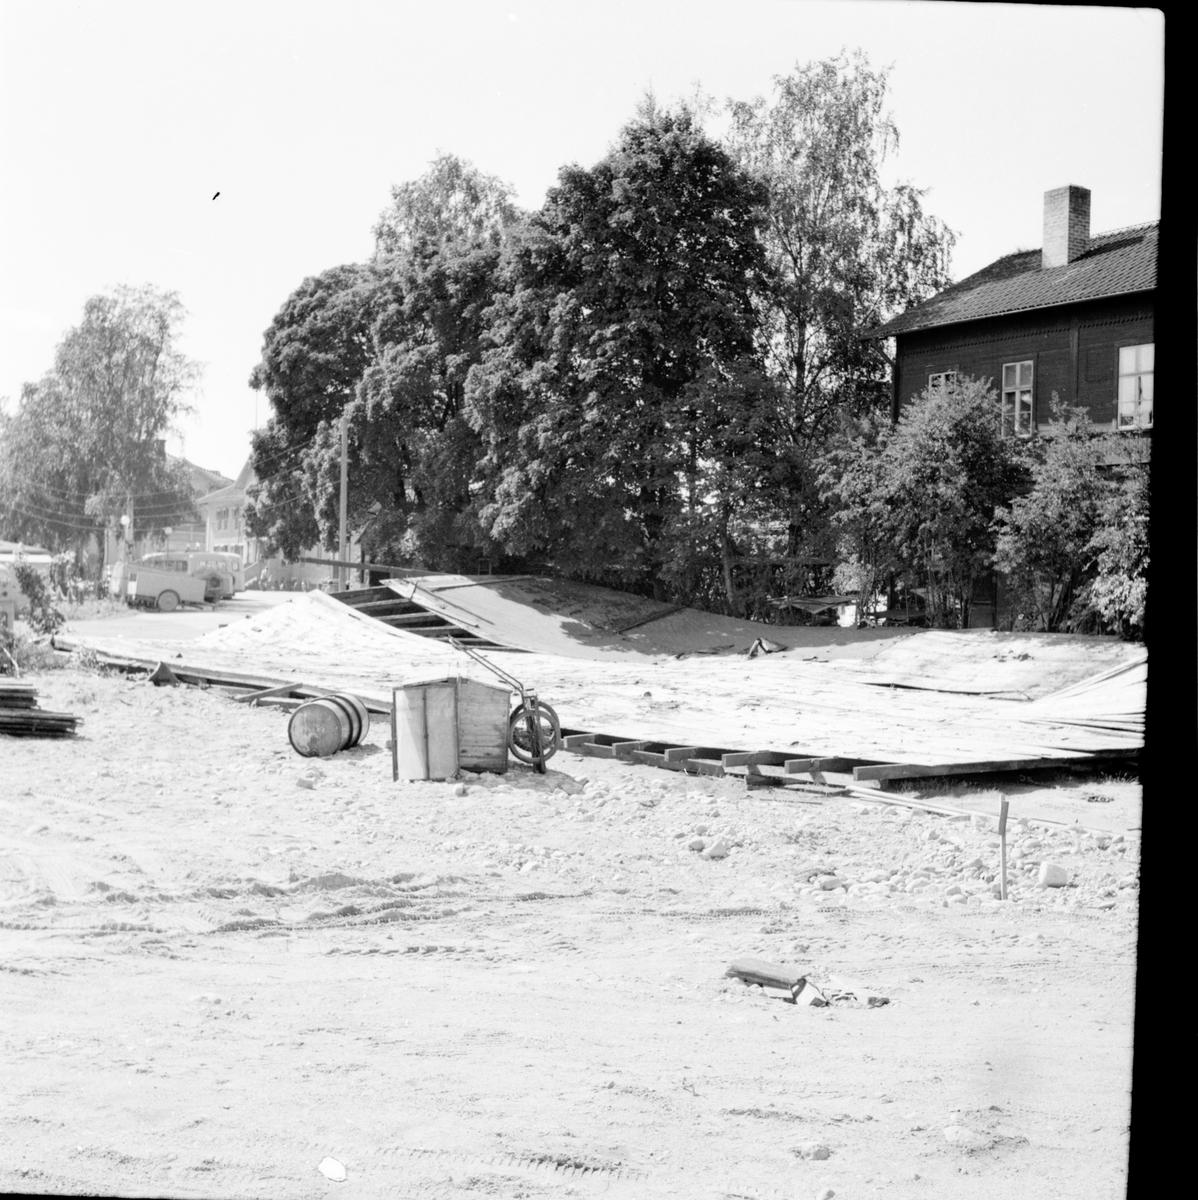 Furuvik, Hälsinglands Dag, 22 aug. 1954